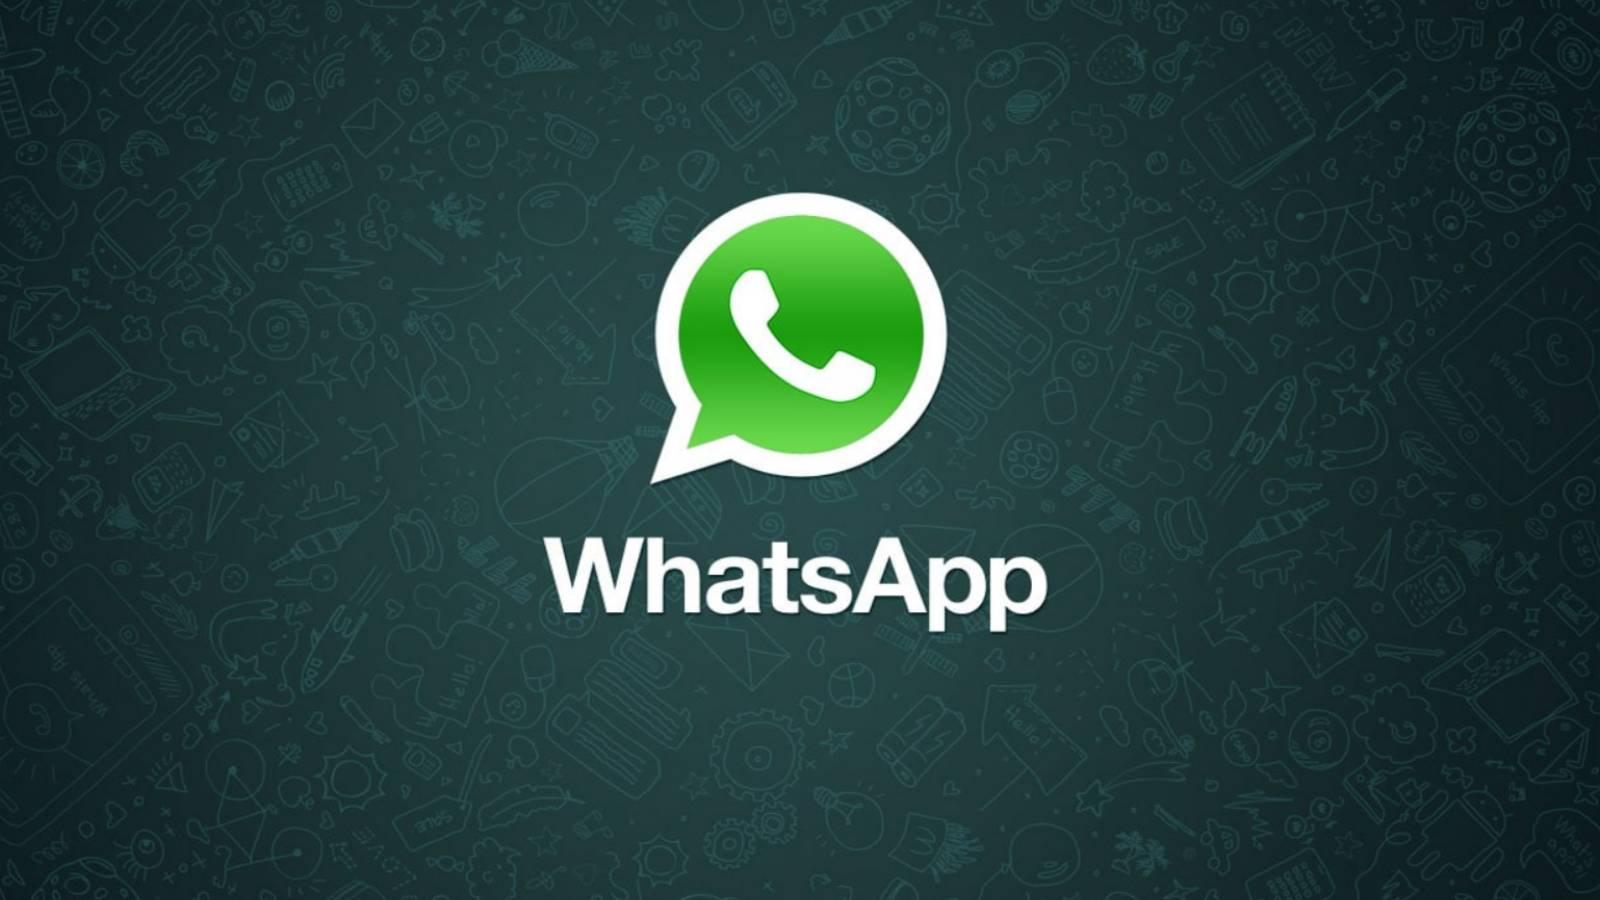 WhatsApp extras